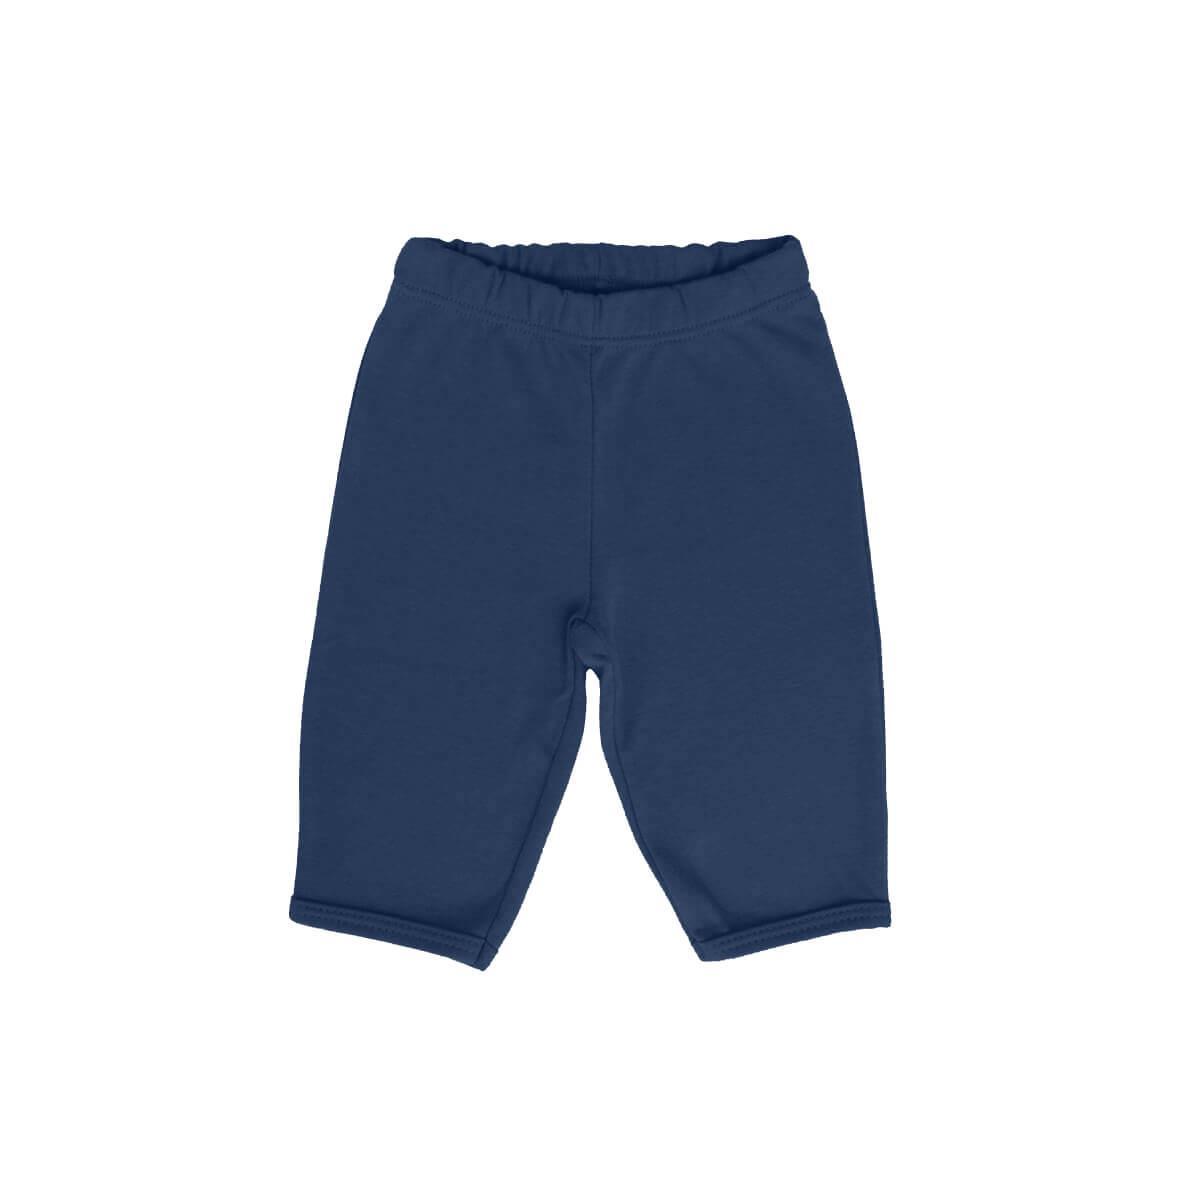 Calça Básica Azul Marinho  - Piu Blu